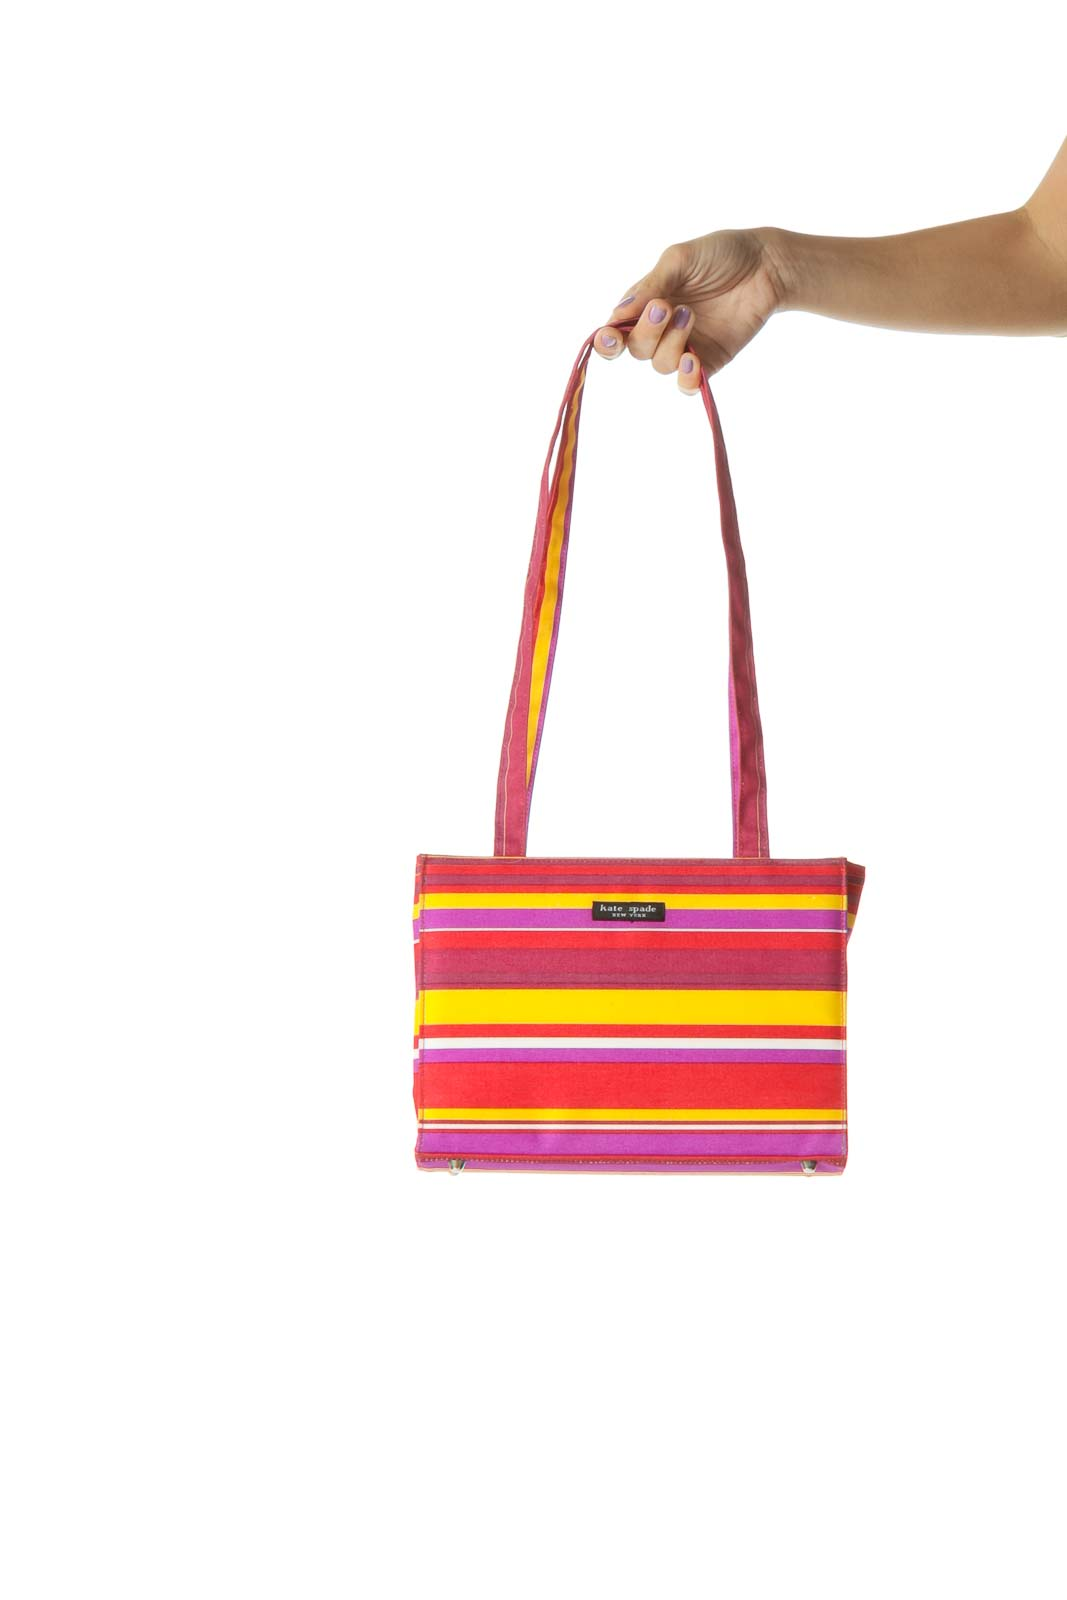 Red and Purple Multicolor Striped Shoulder Bag Front